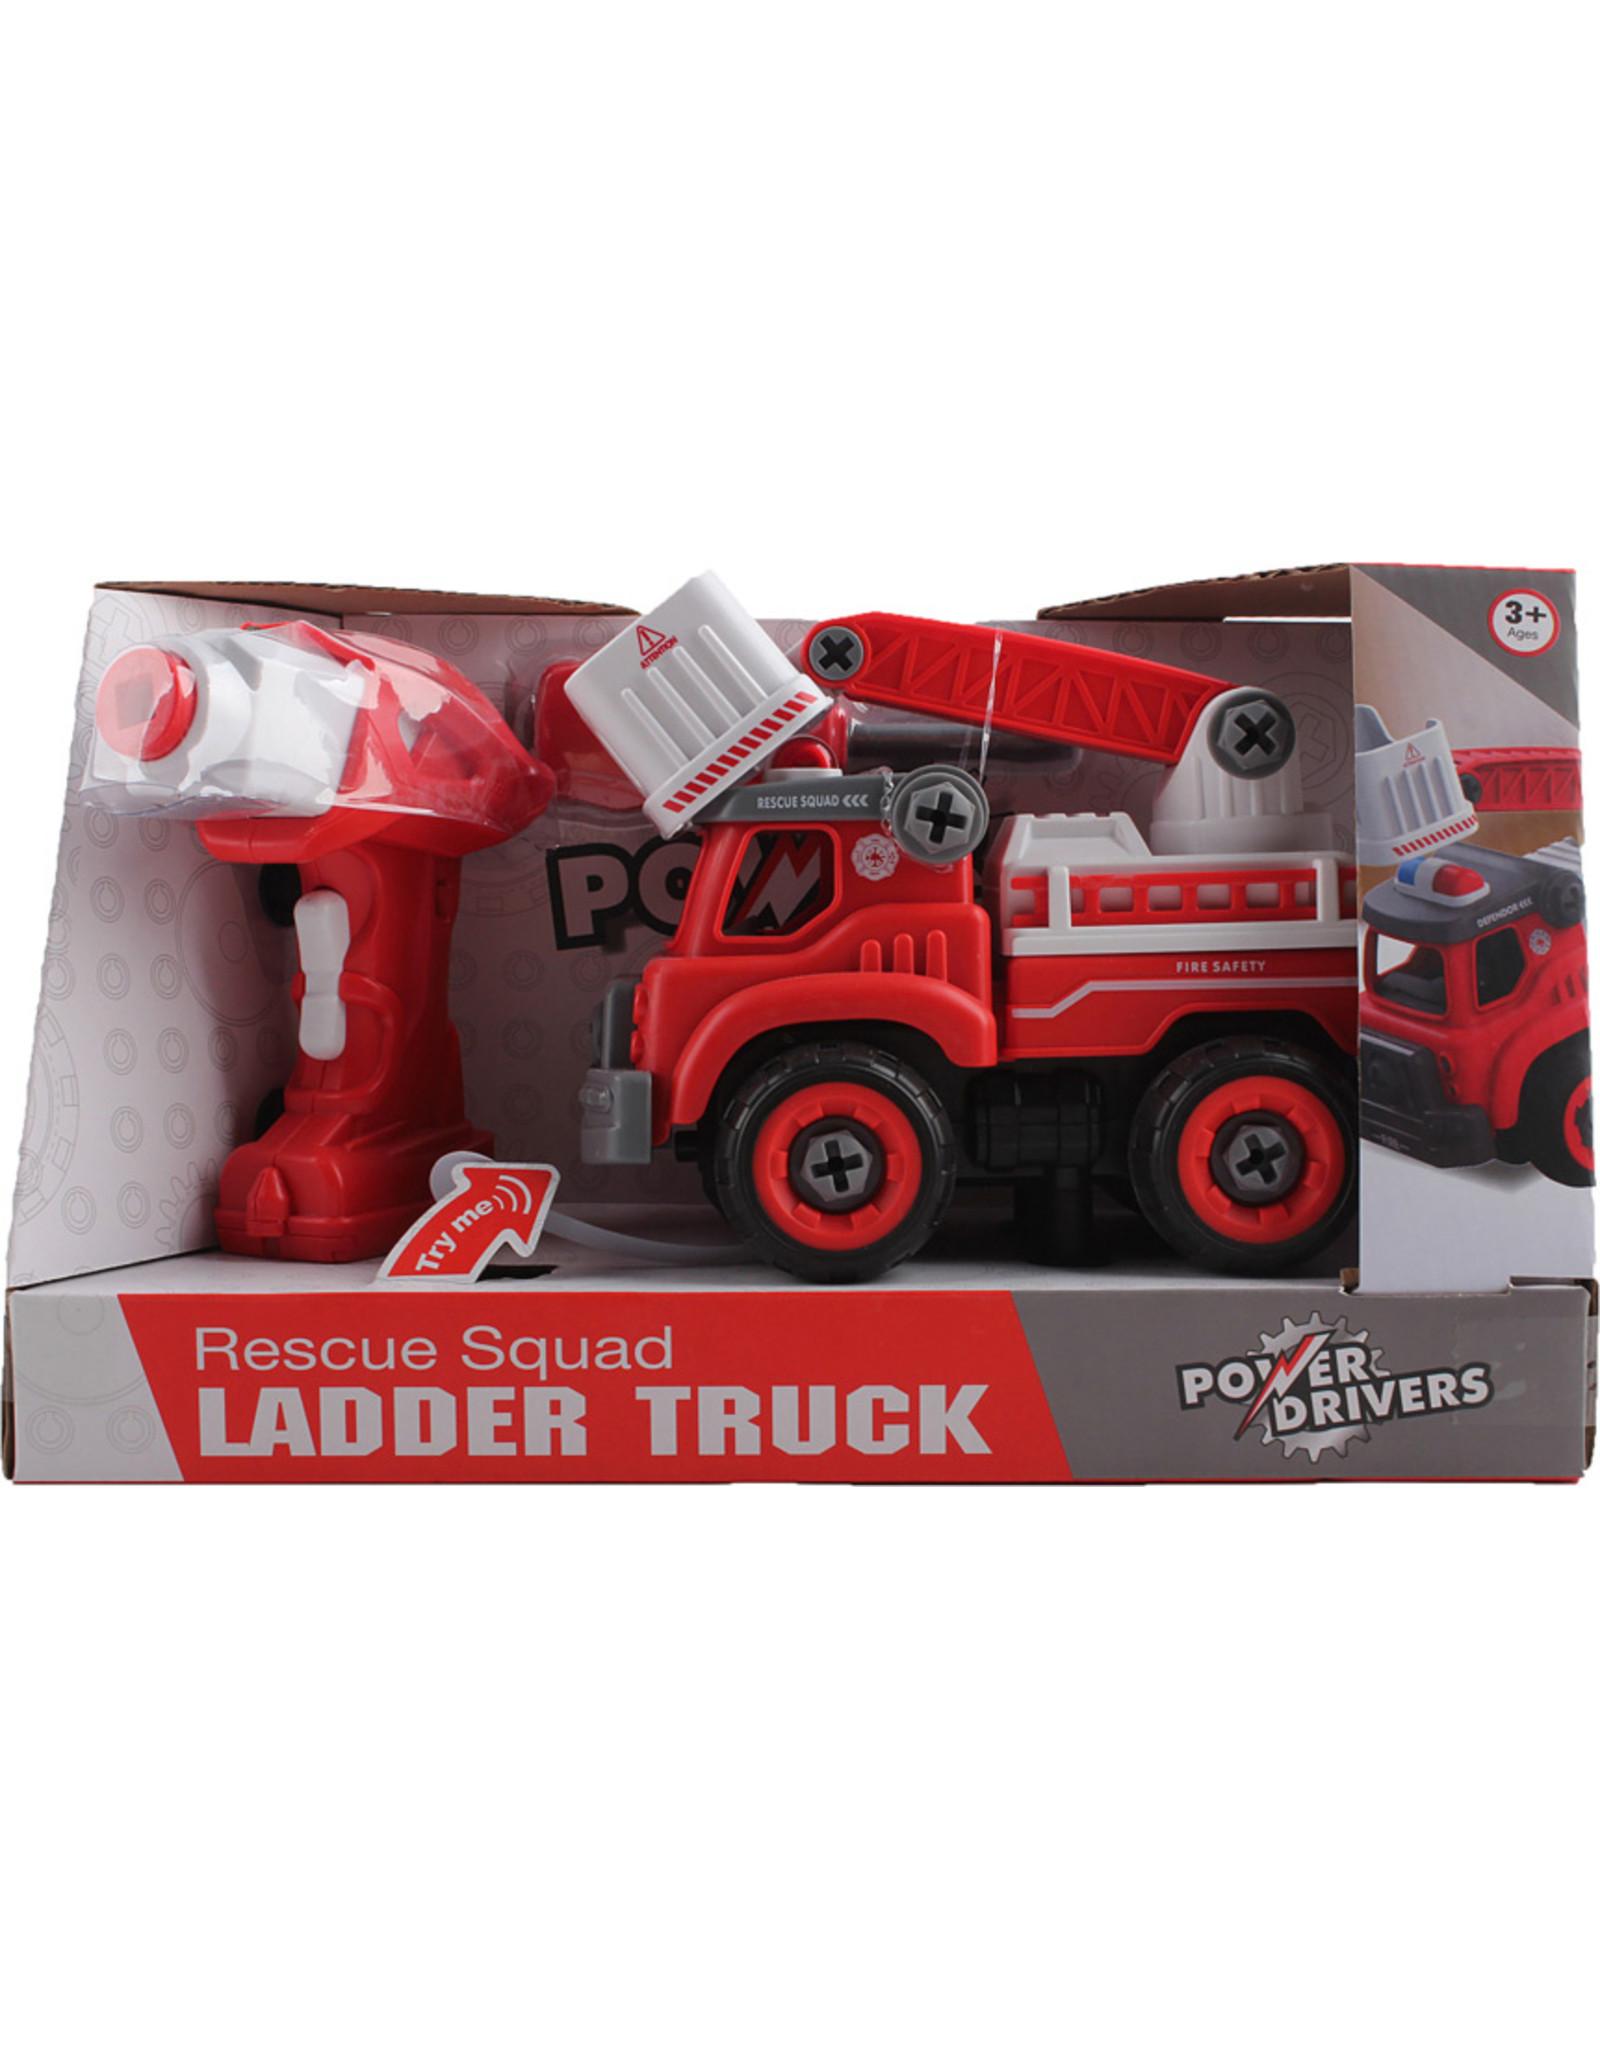 Flybar RC Ladder Truck